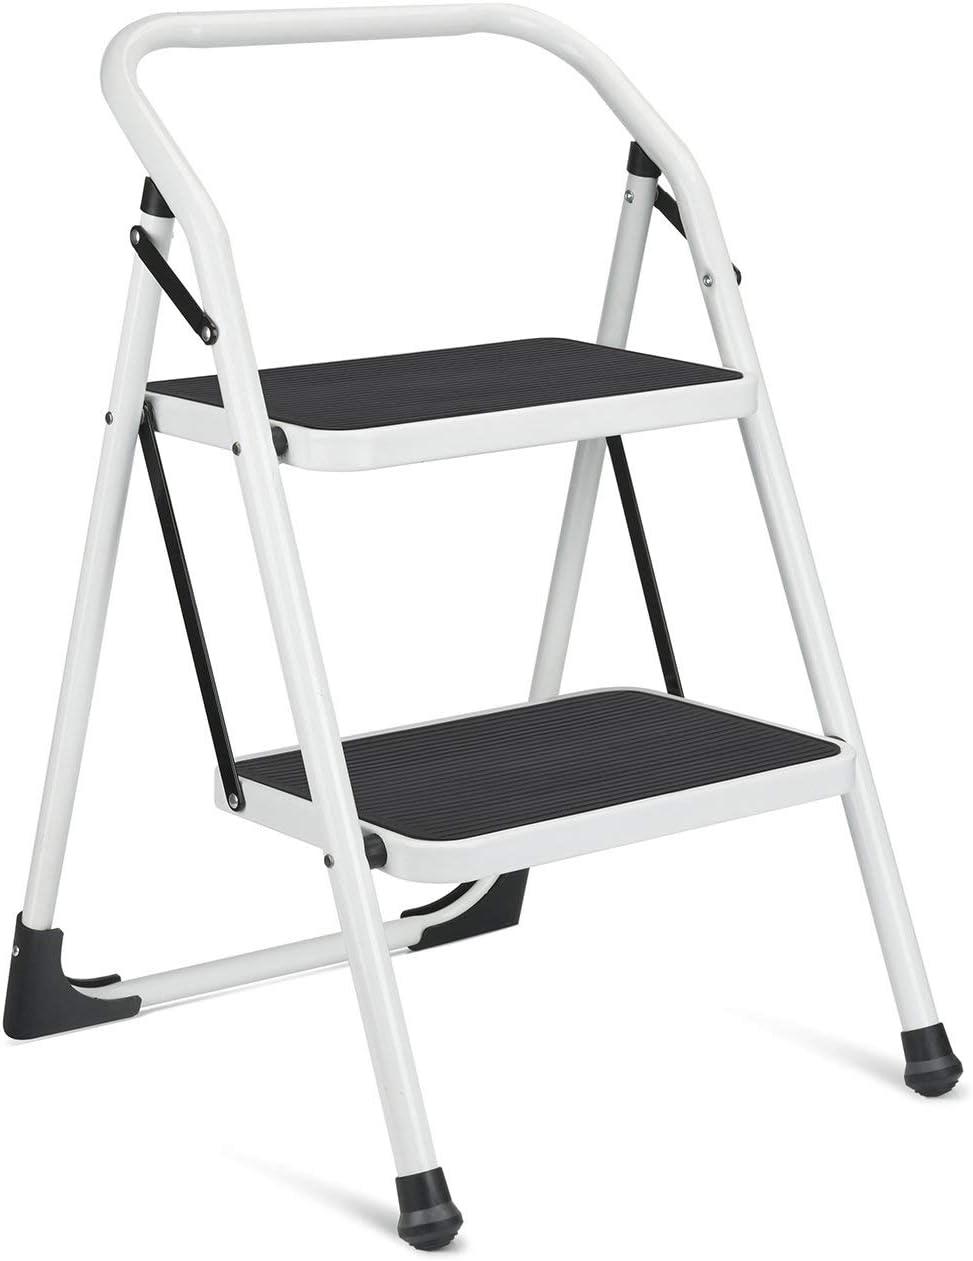 Plastic Folding Step Stool Foldable Portable Multi Purpose Heavy Duty Ladders